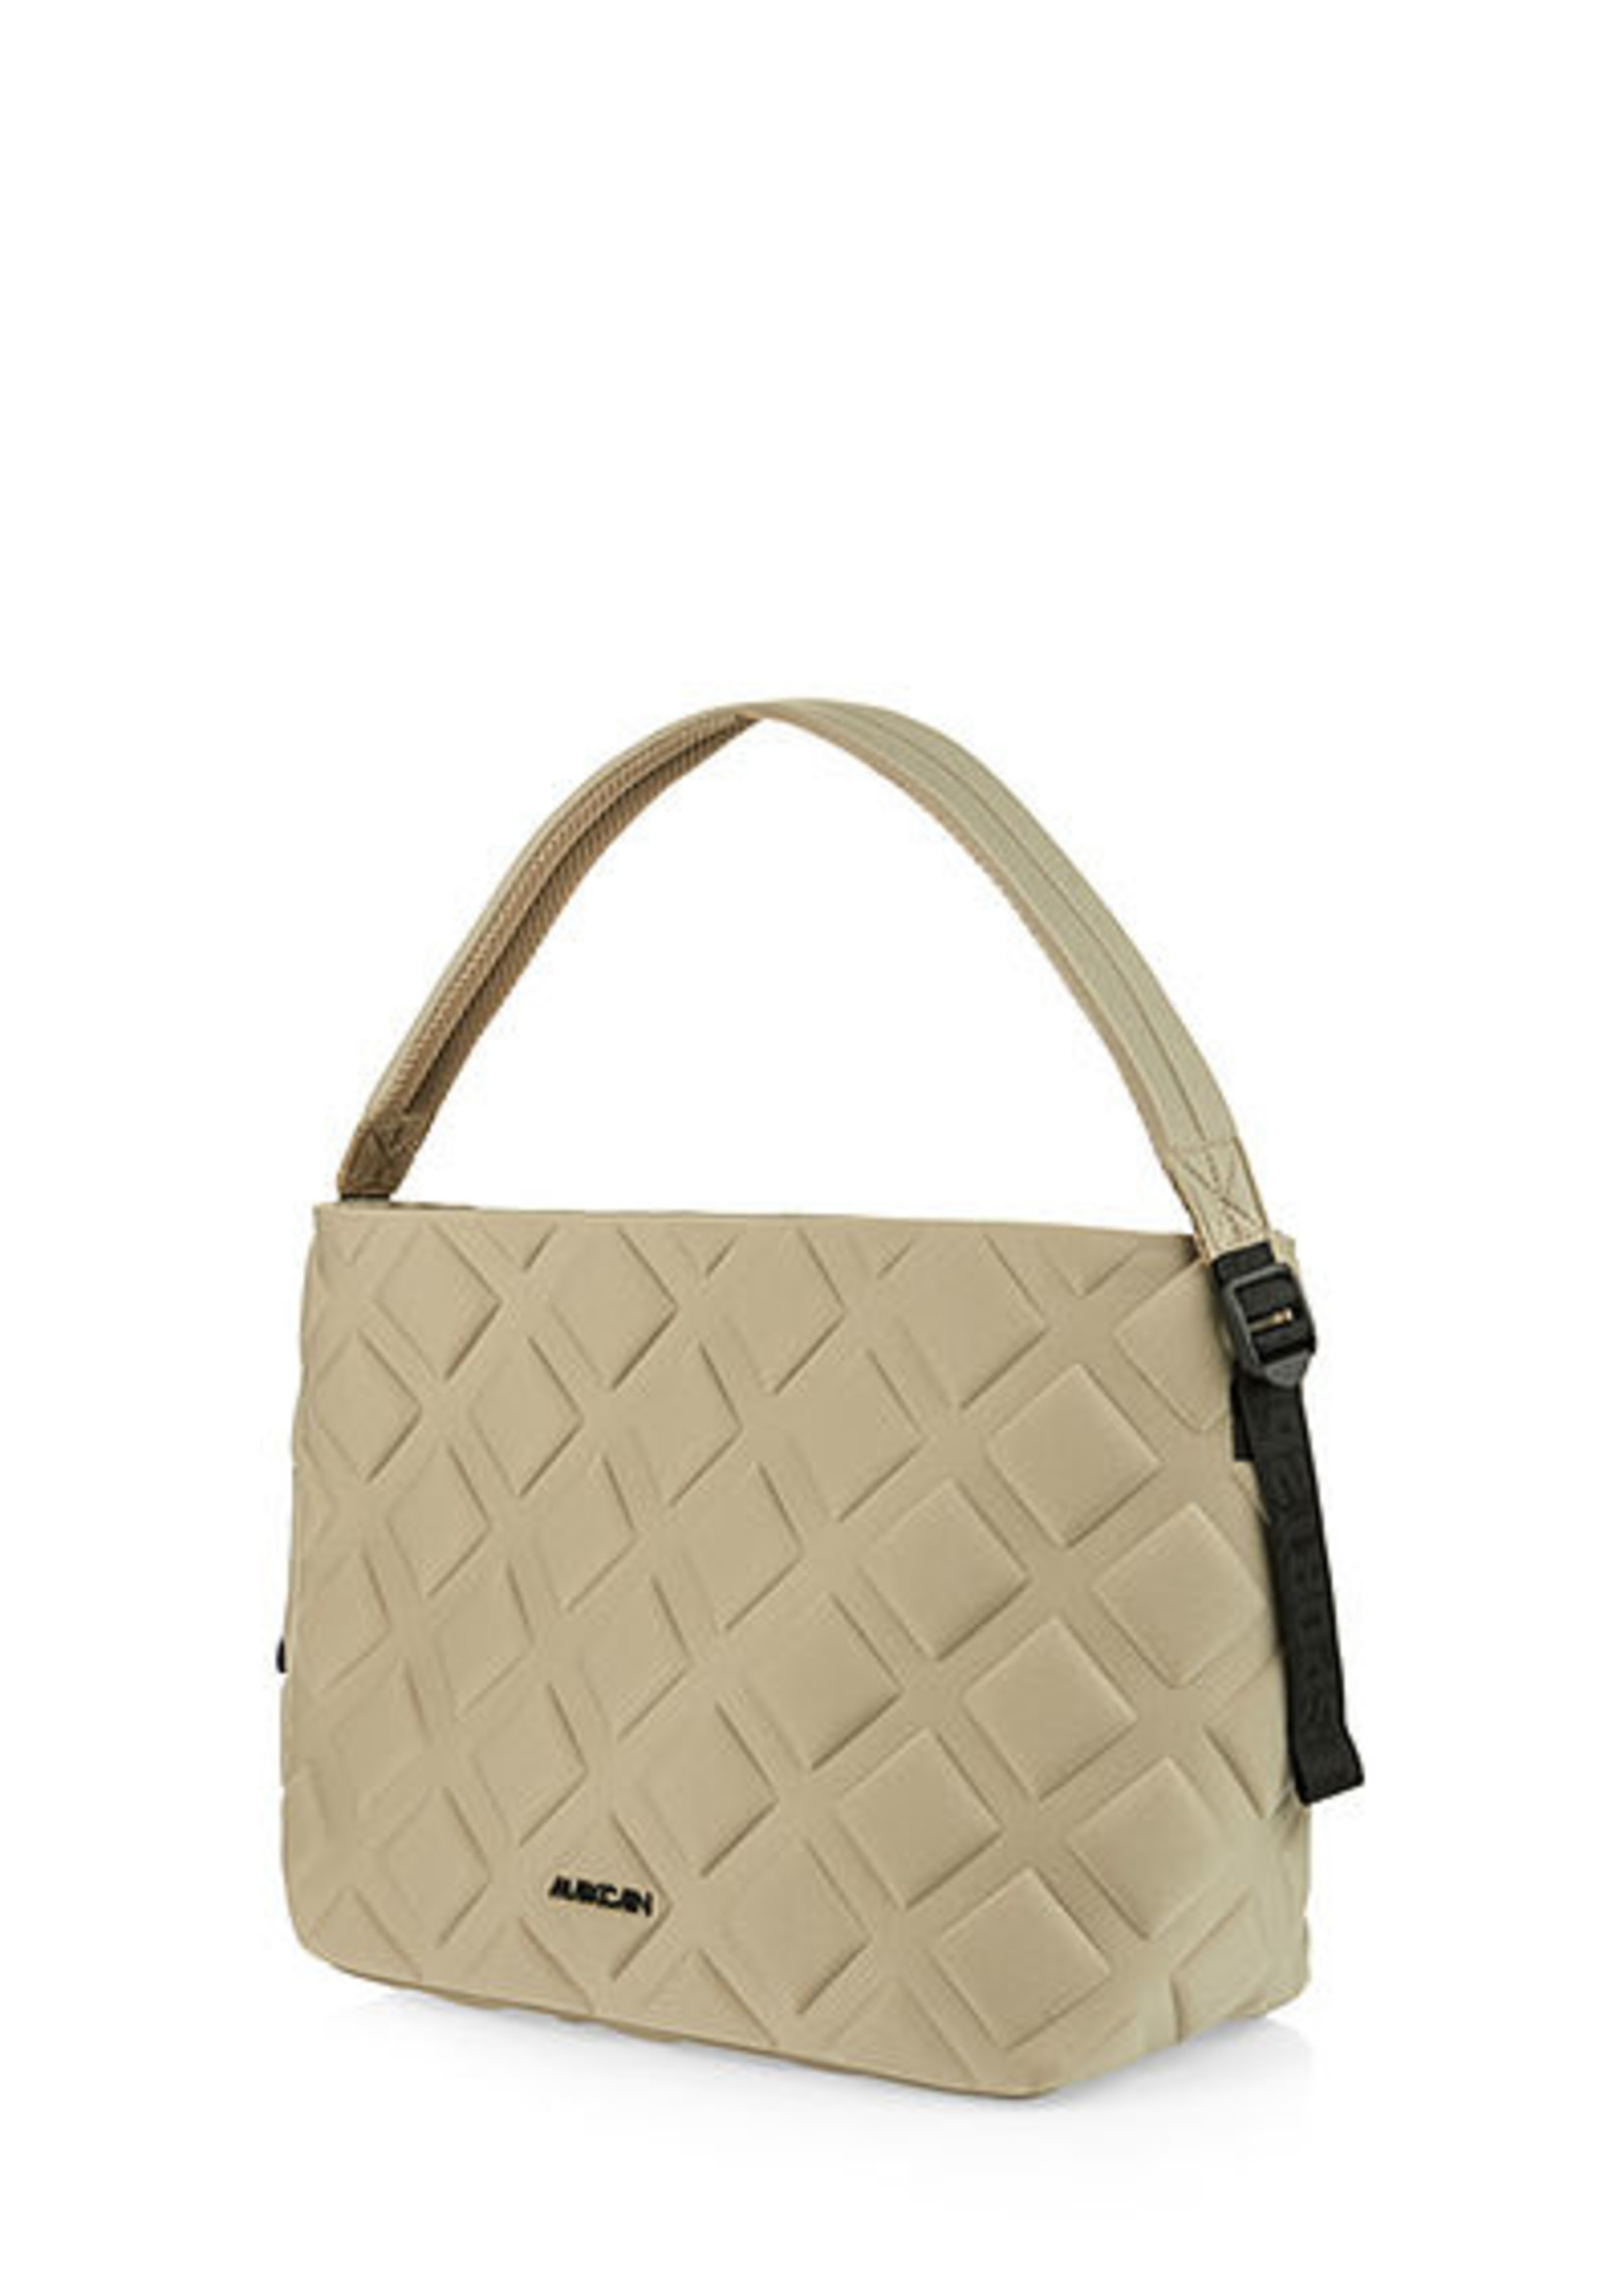 Marccain Bags & Shoes Handtas RB TJ.06 J05 latte macchiato